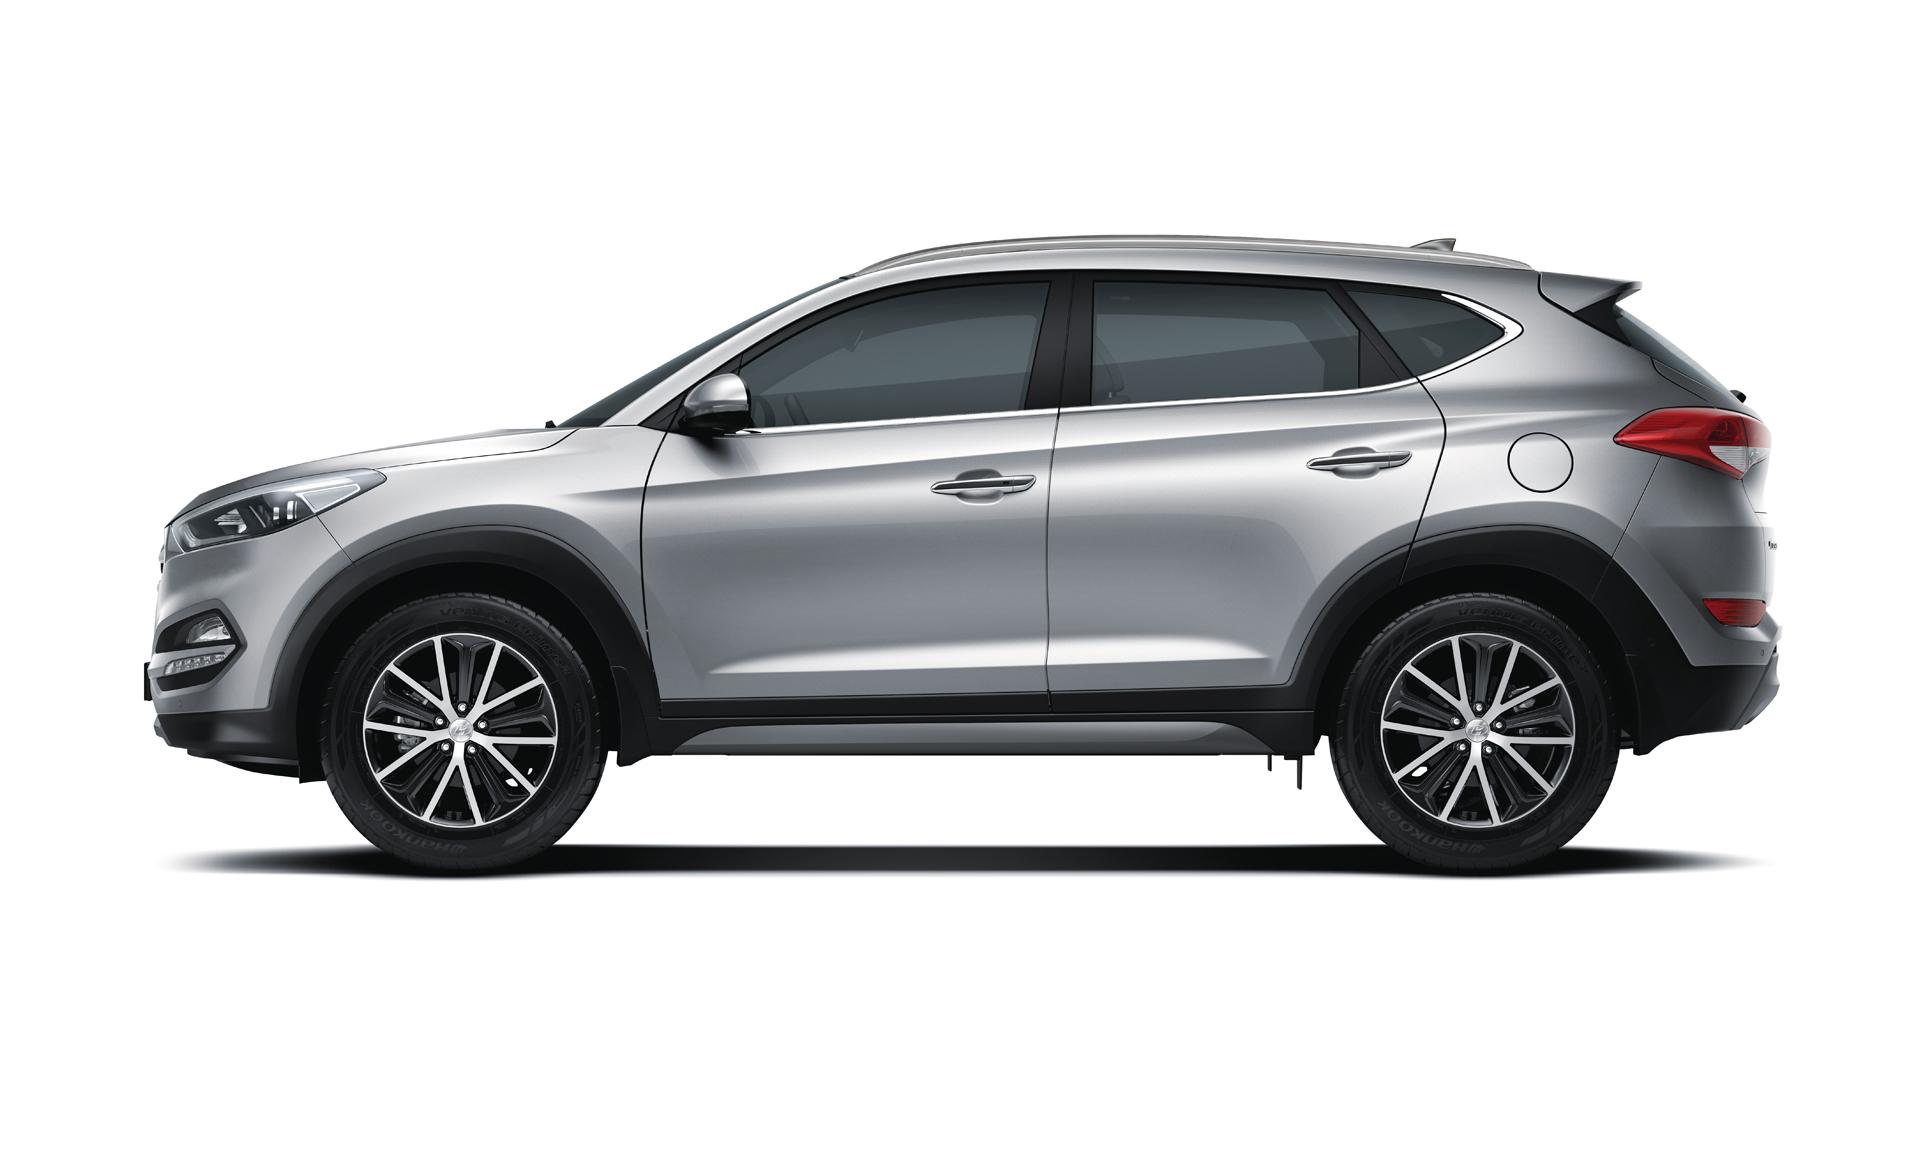 2016 Hyundai Tucson Launched In India 2 0l Petrol